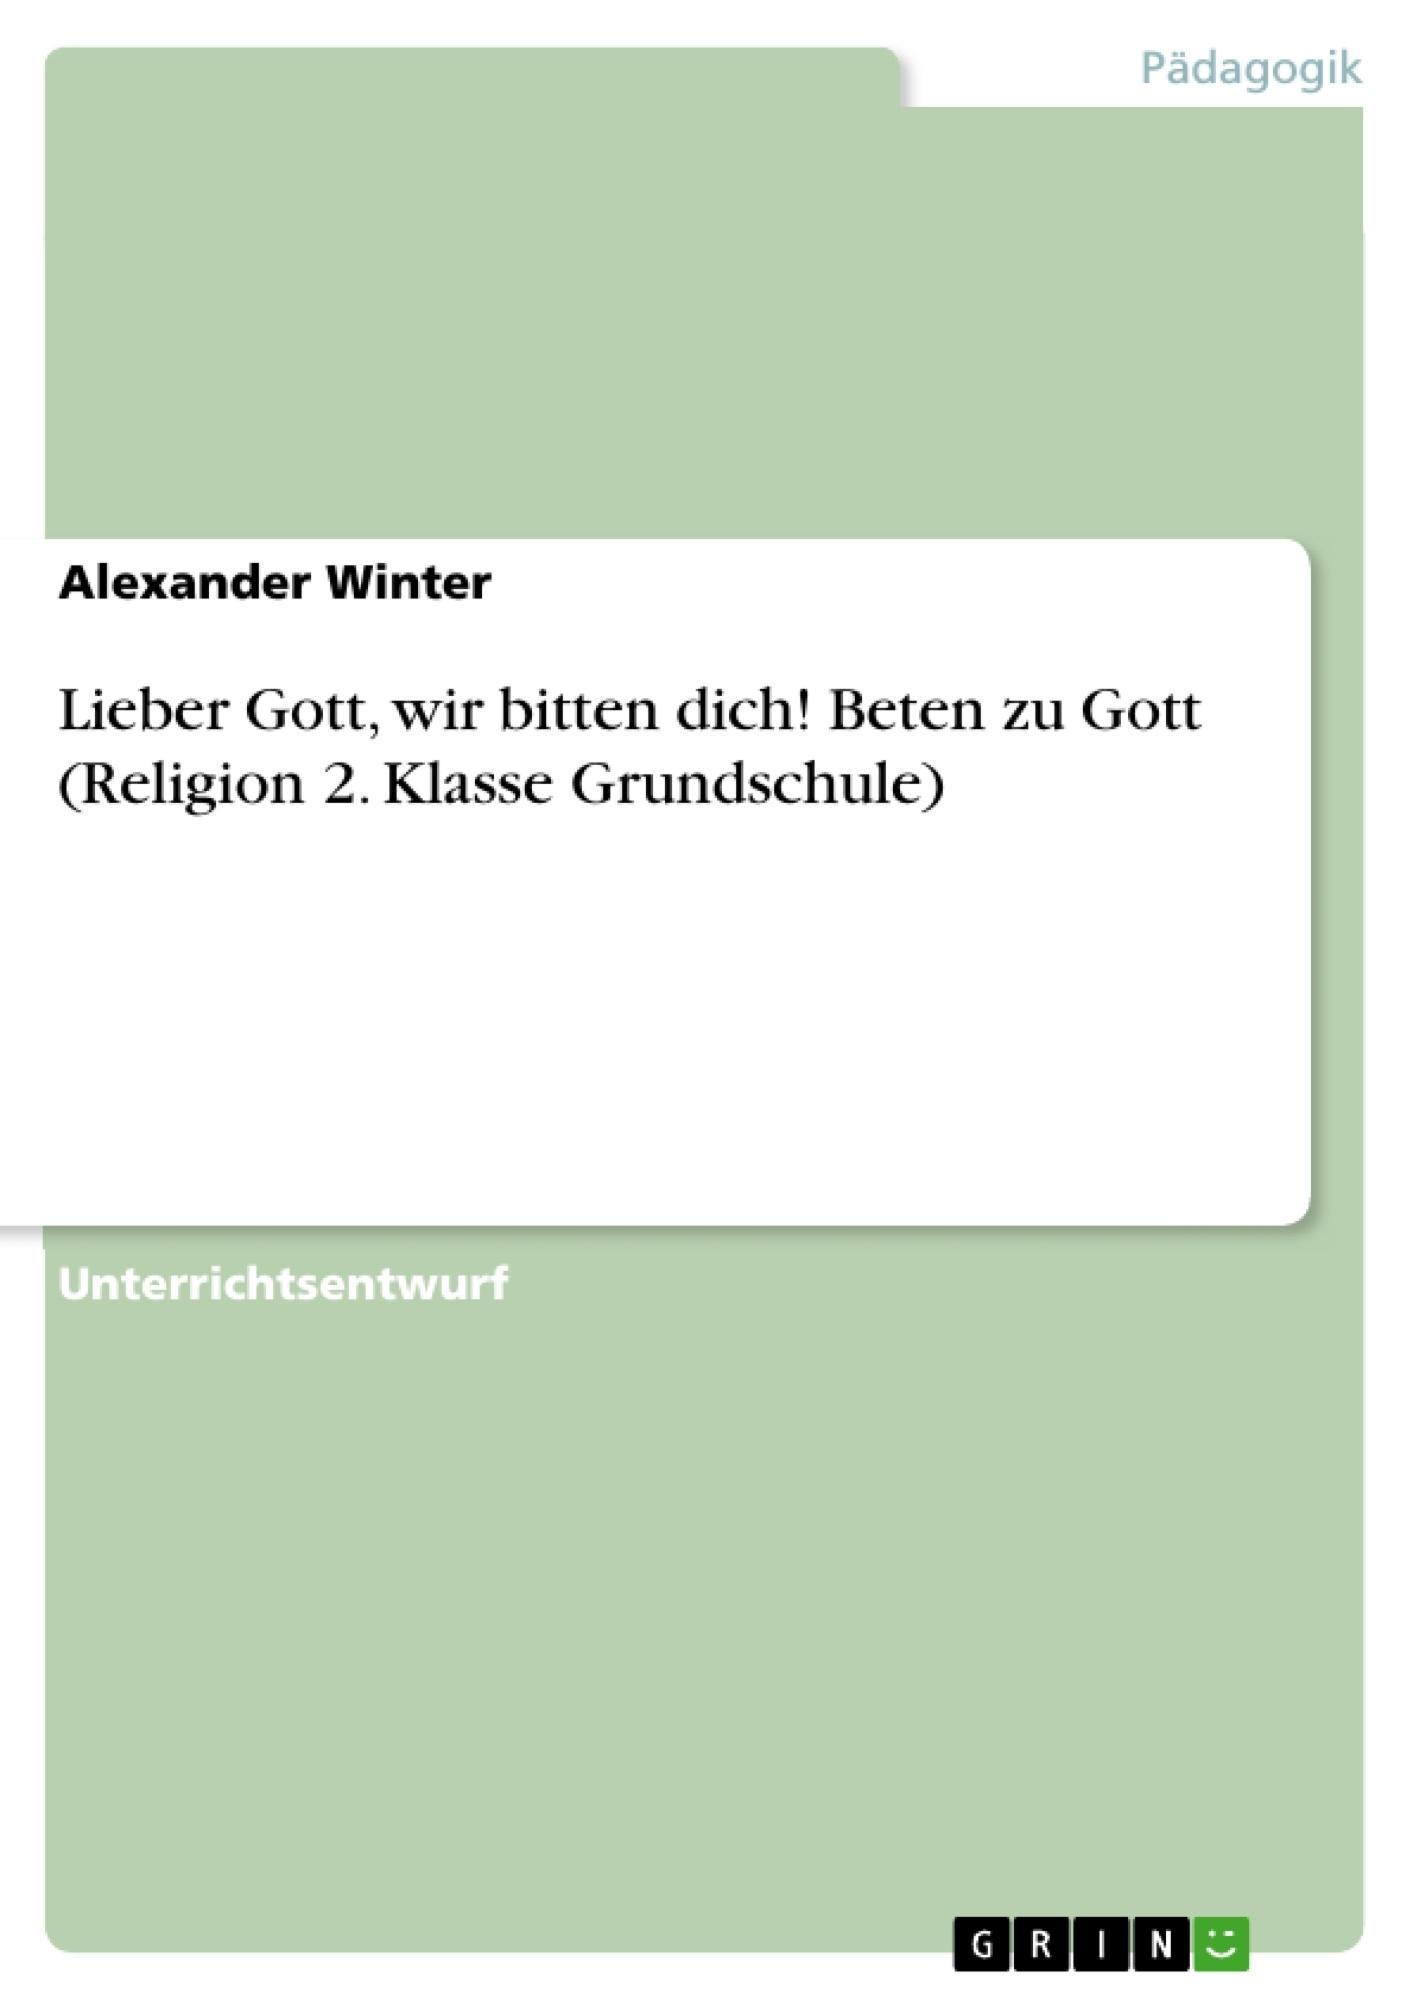 Titel: Lieber Gott, wir bitten dich! Beten zu Gott (Religion 2. Klasse Grundschule)